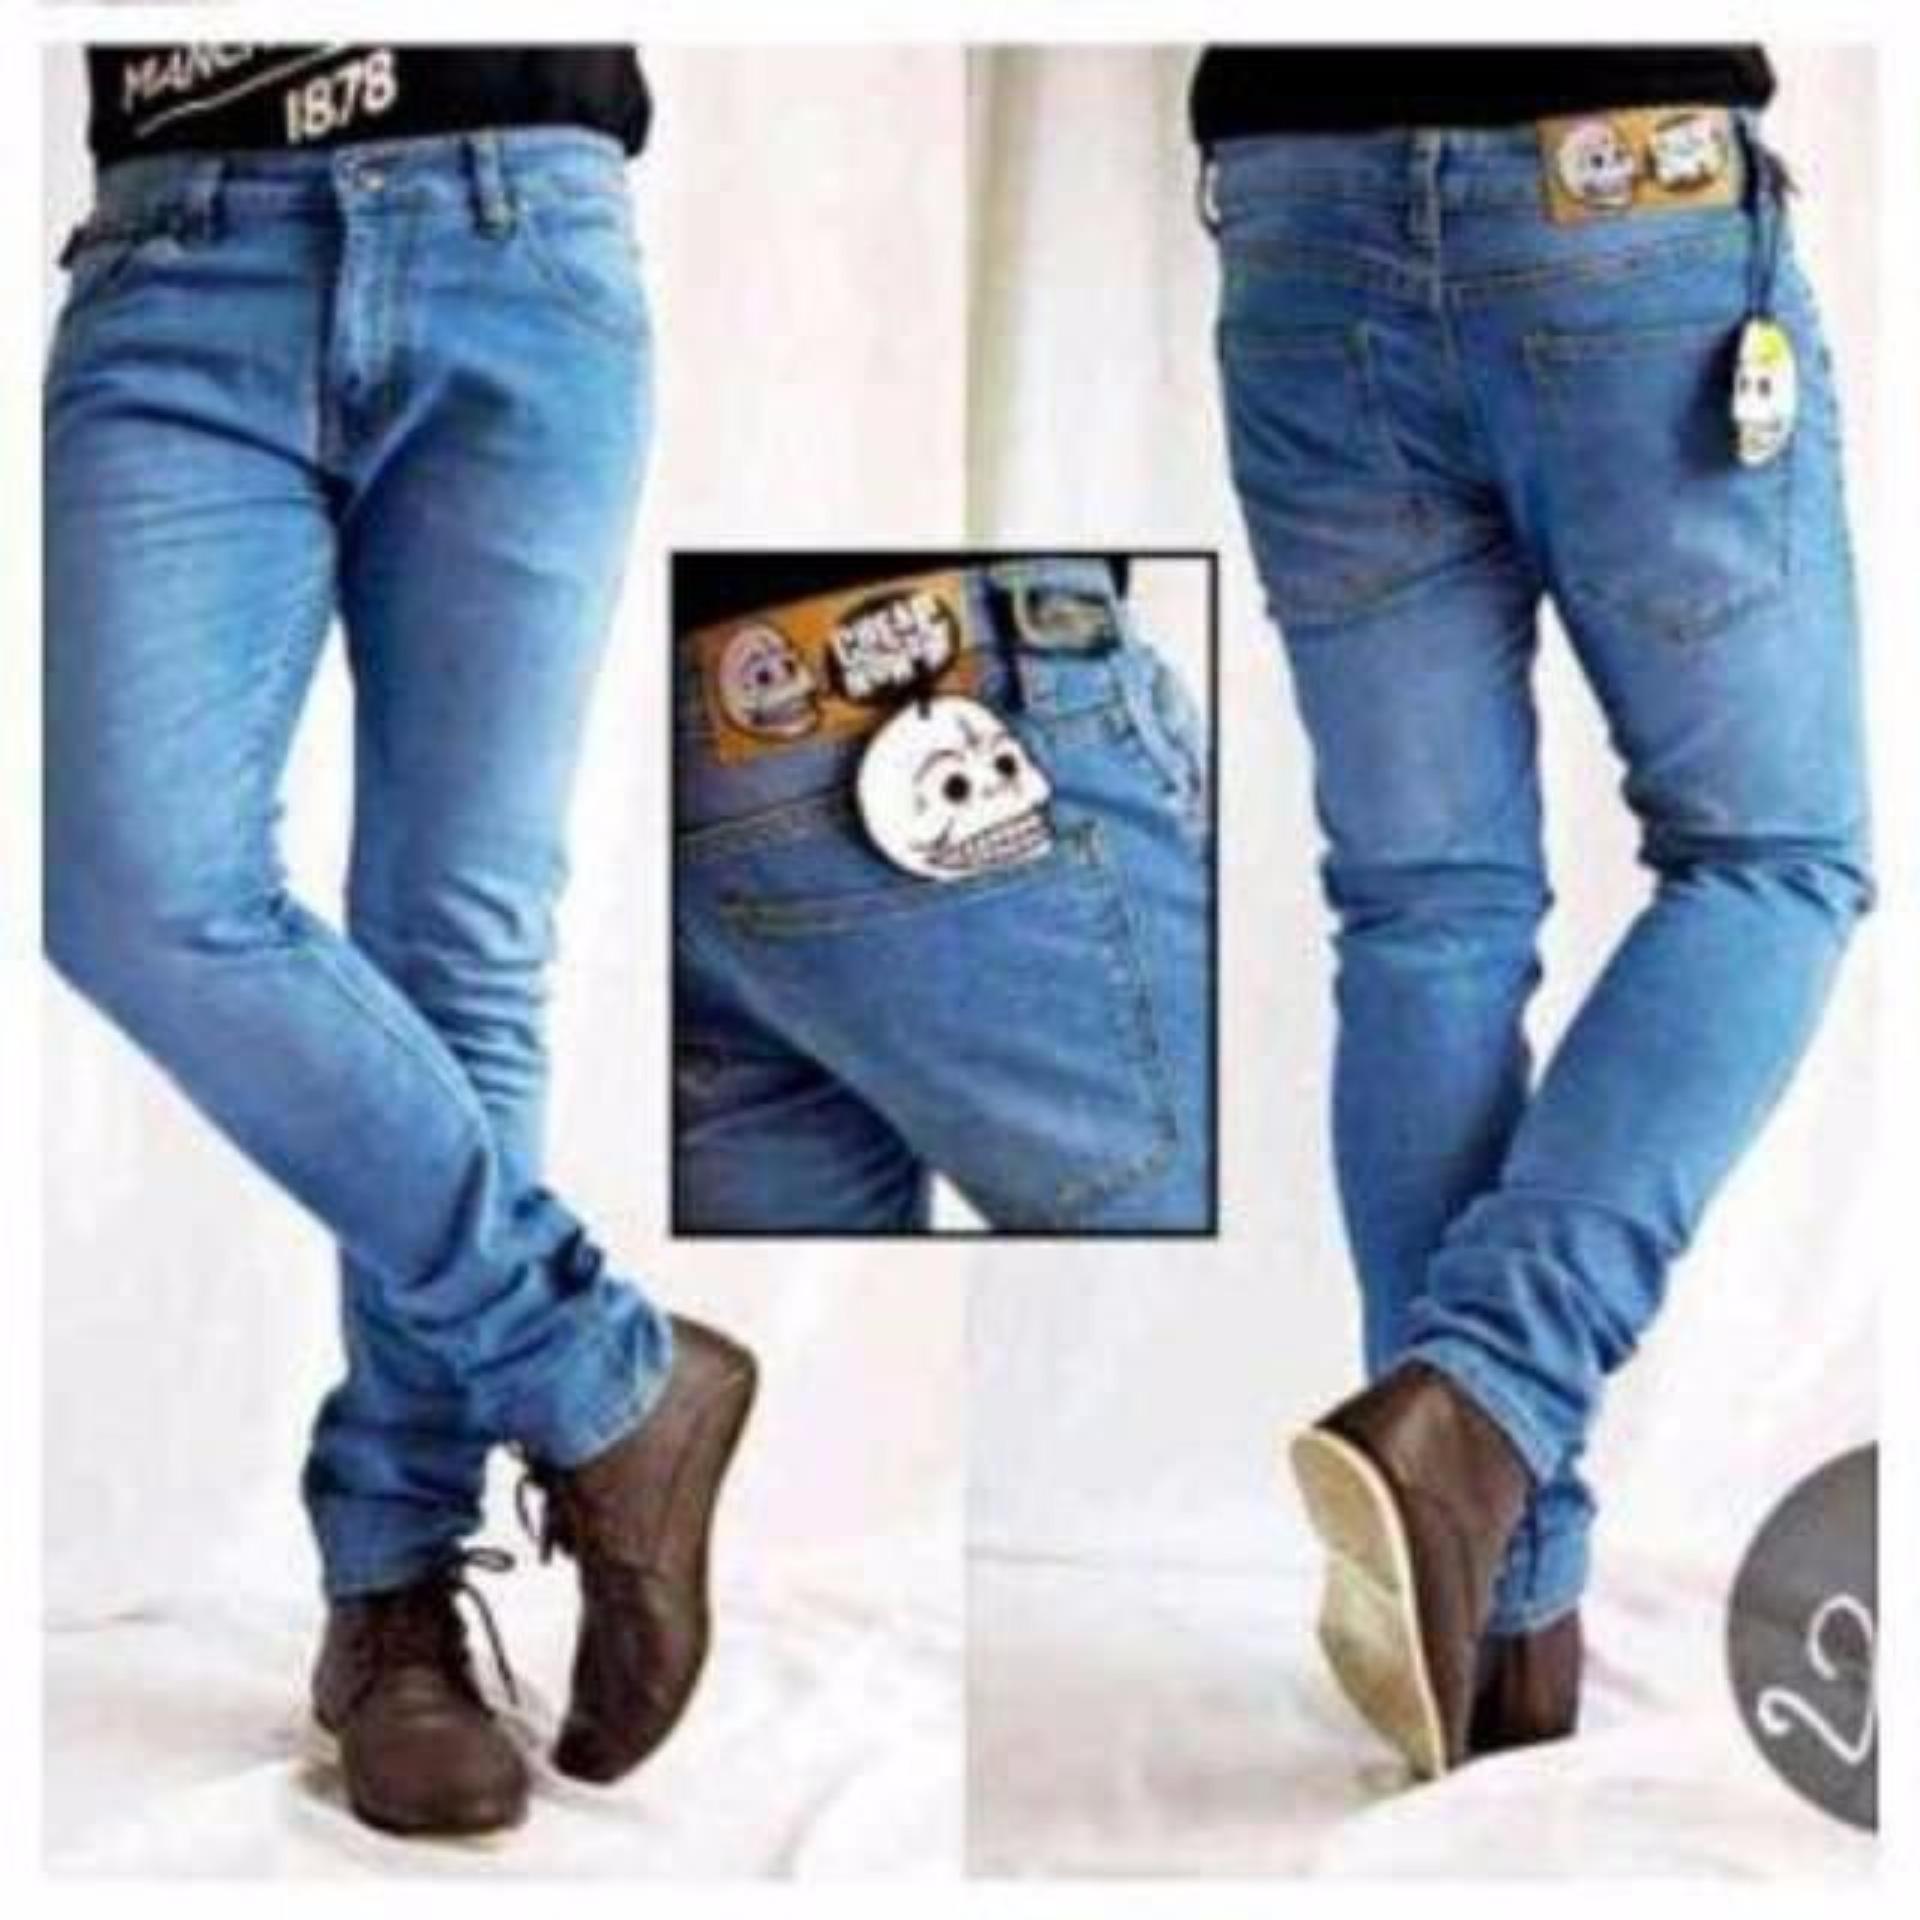 Fashion Pria Celana Lois Fit Skinny Warna Hitam Daftar Harga Jeans Original Panjang Sskt081 Navy 33 Cheap Monday Biru